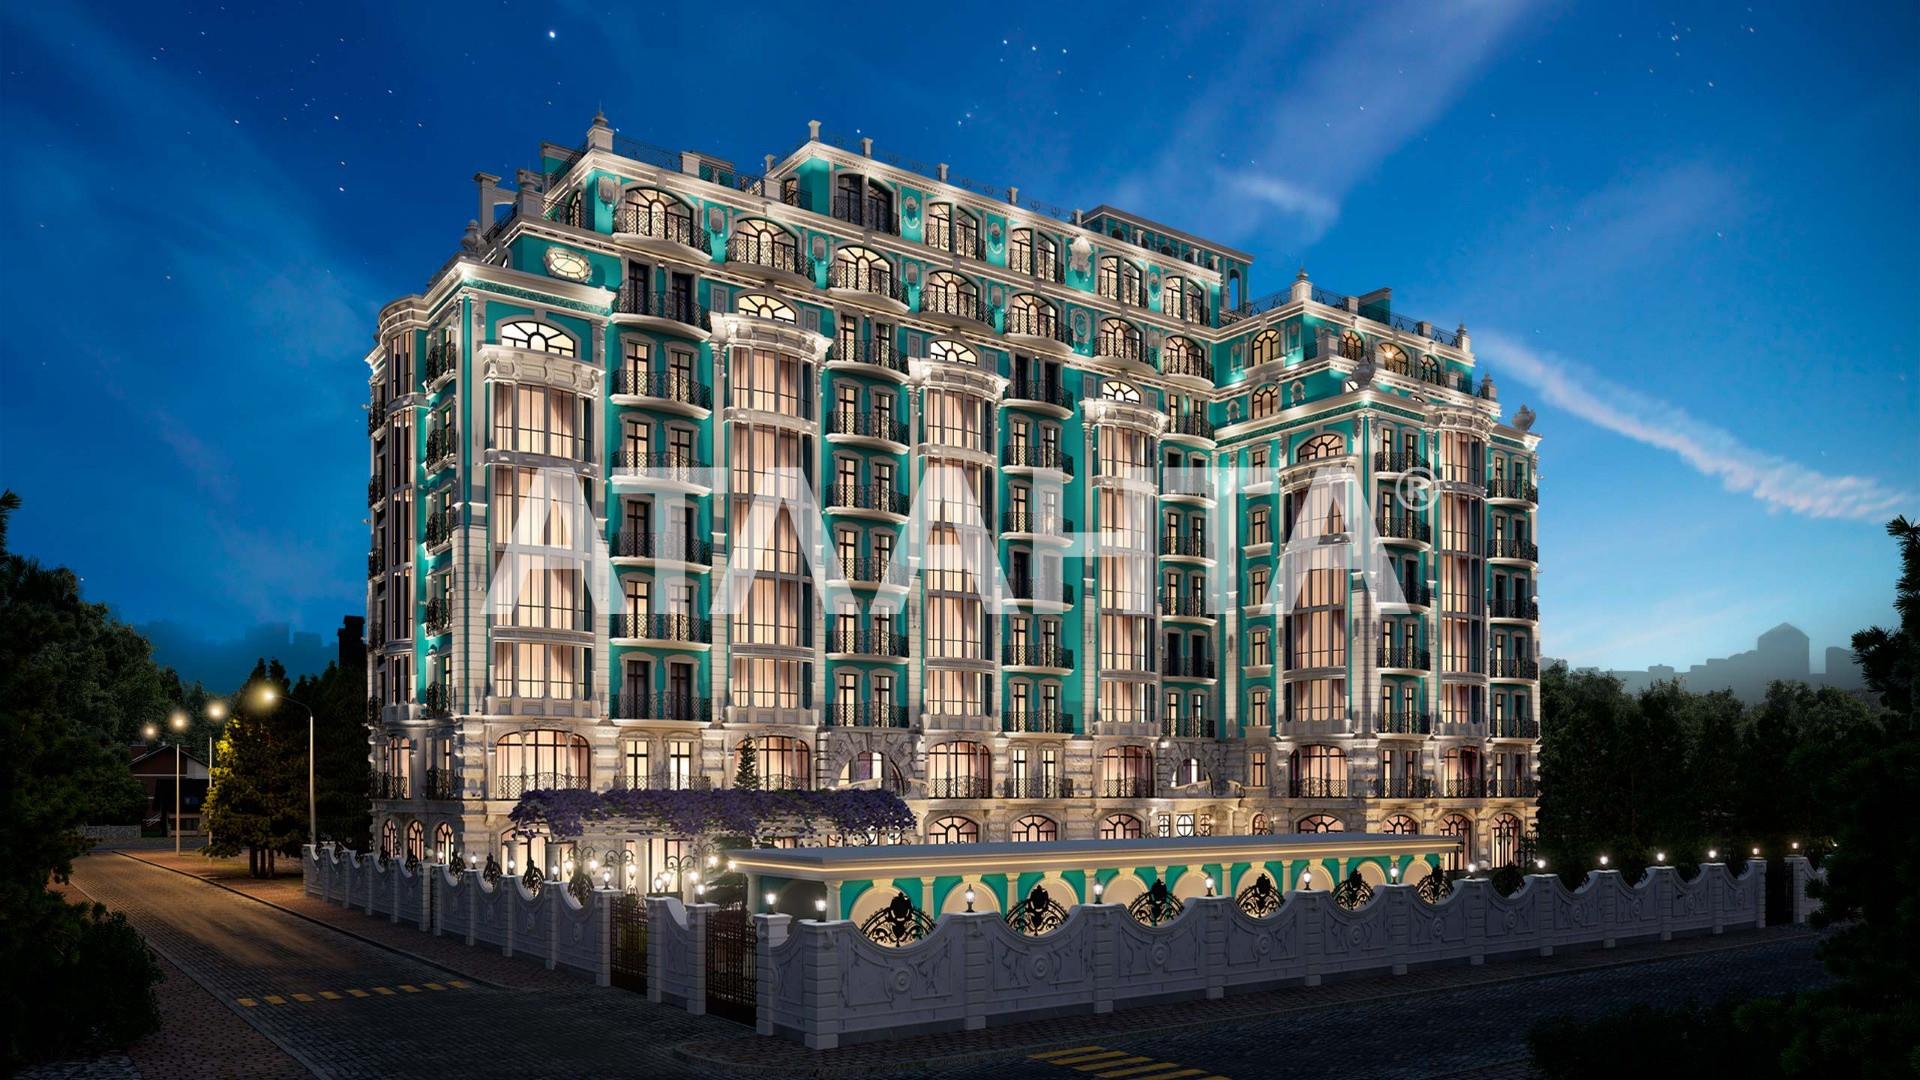 Продается 3-комнатная Квартира на ул. Французский Бул. (Пролетарский Бул.) — 301 530 у.е. (фото №2)